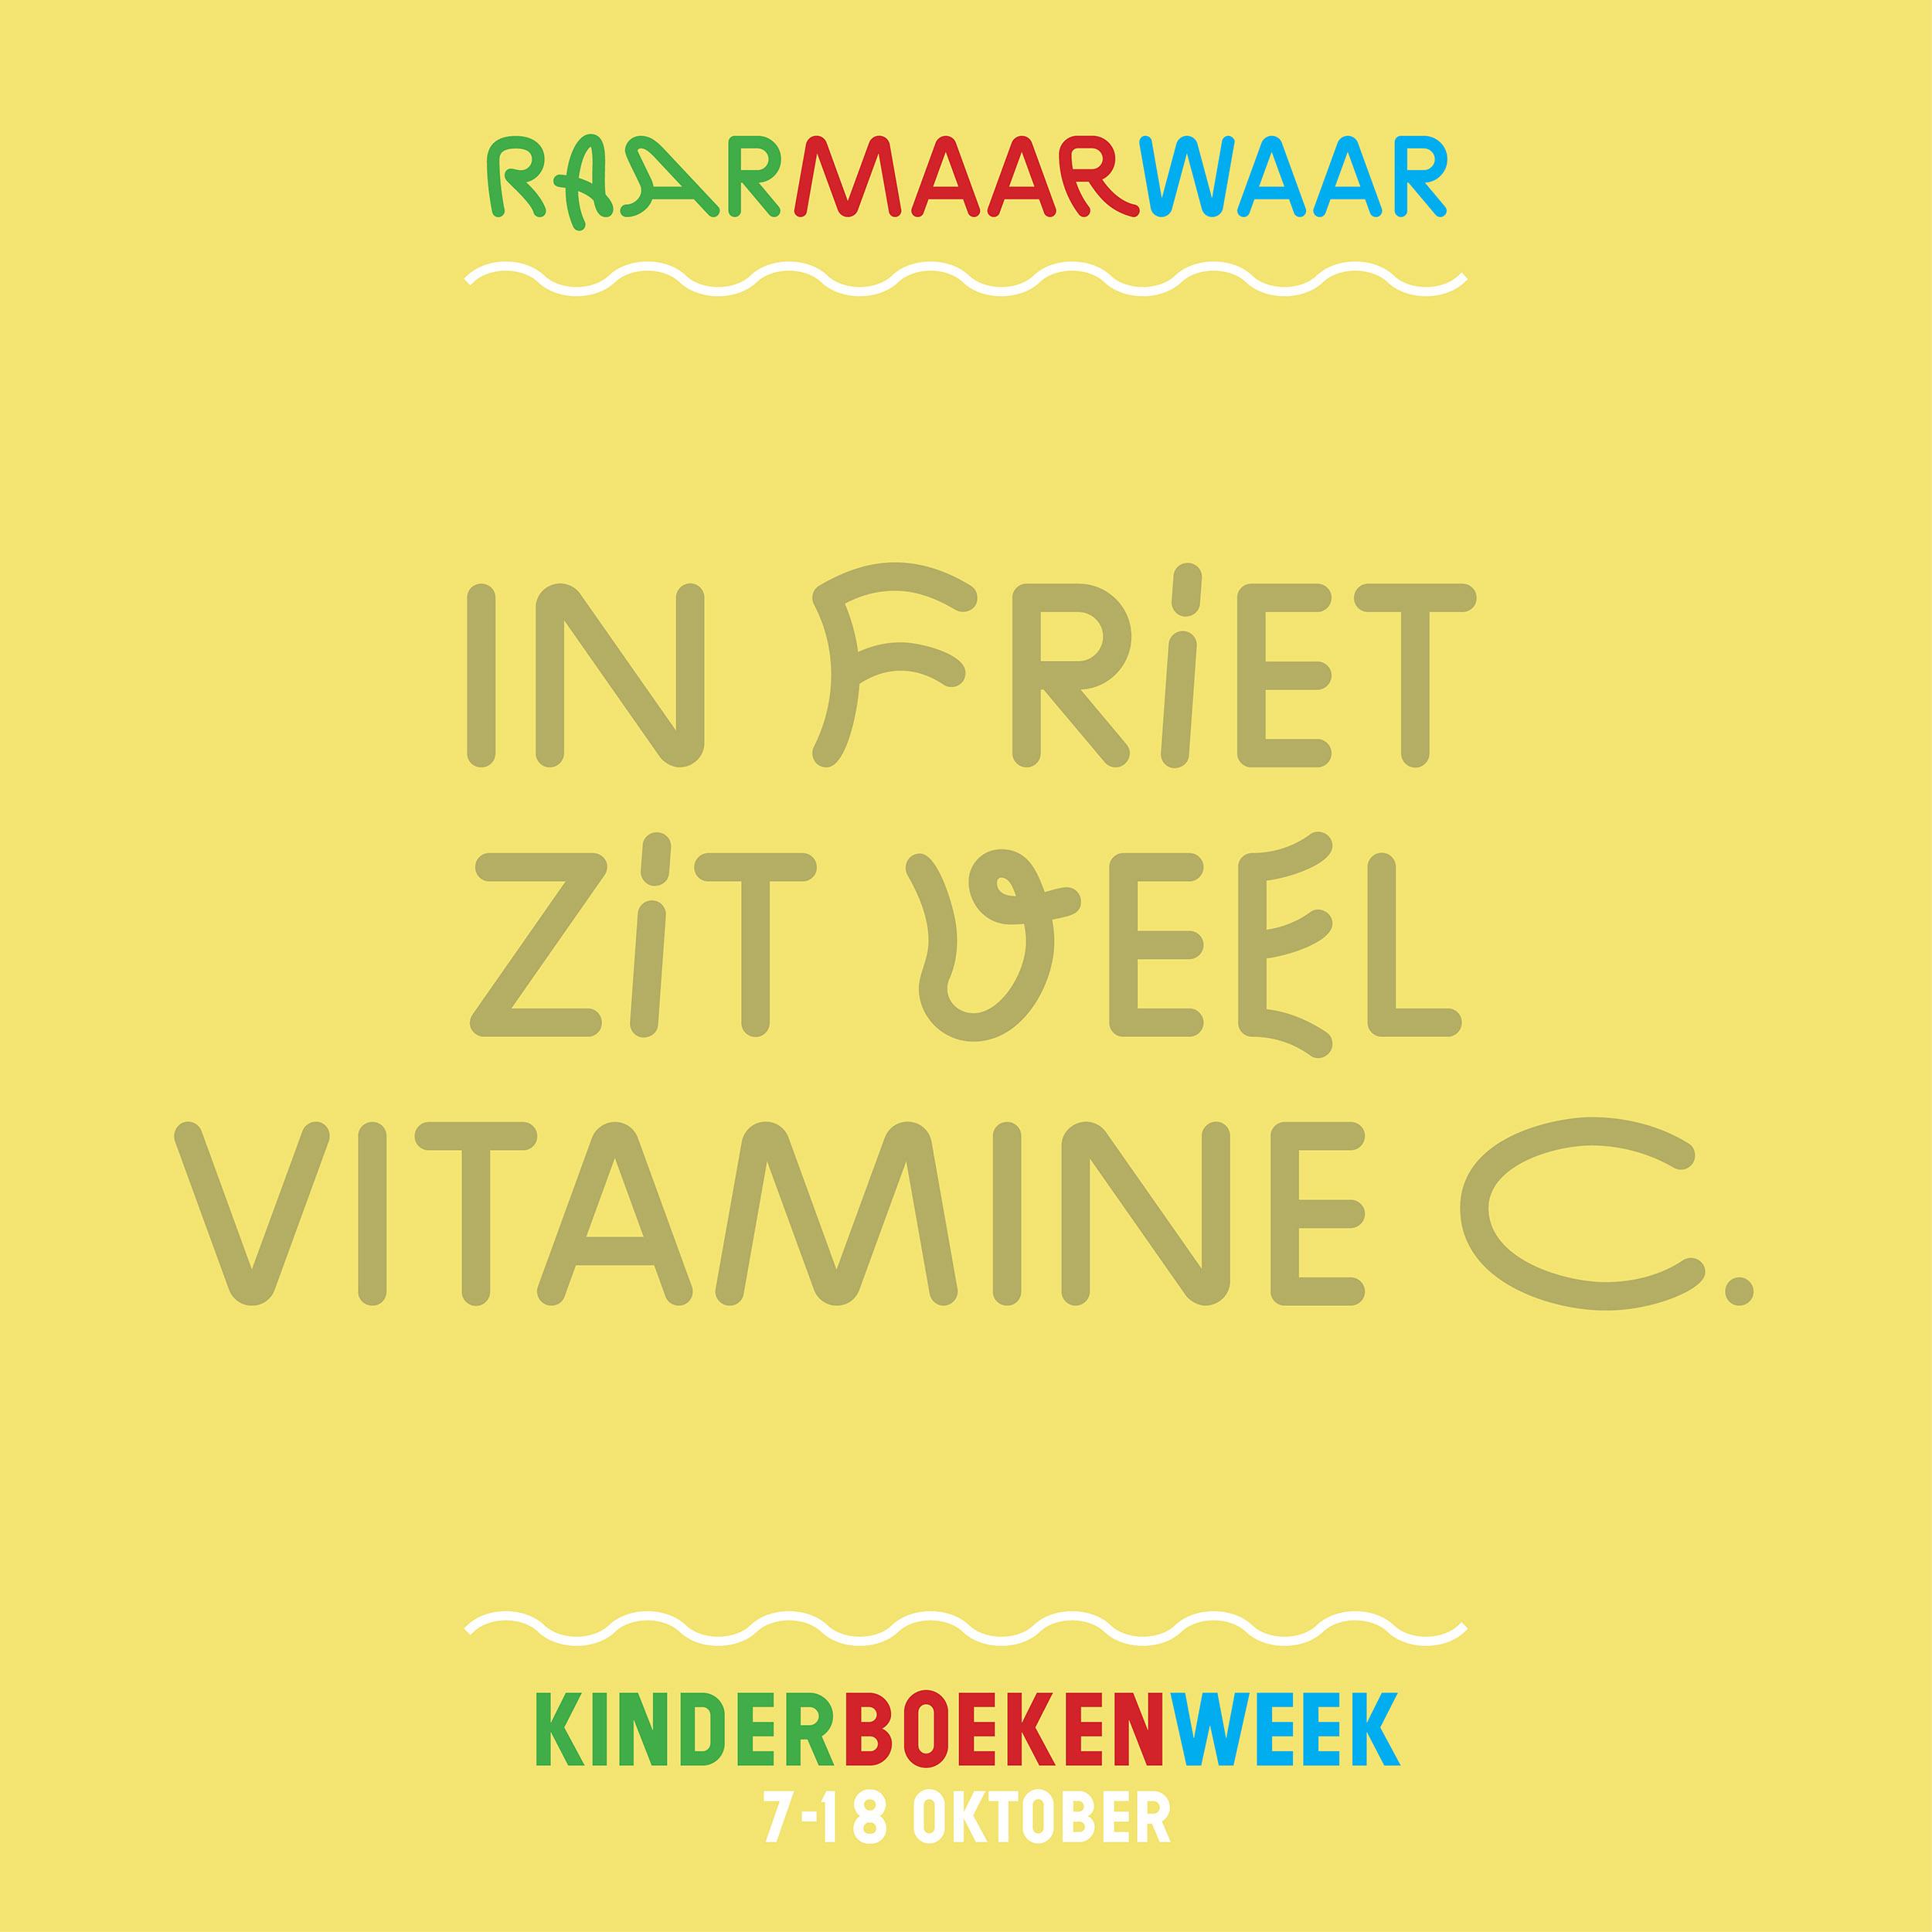 Kinderboekenweek 2015: Raar maar waar! - 4MamaMagazine